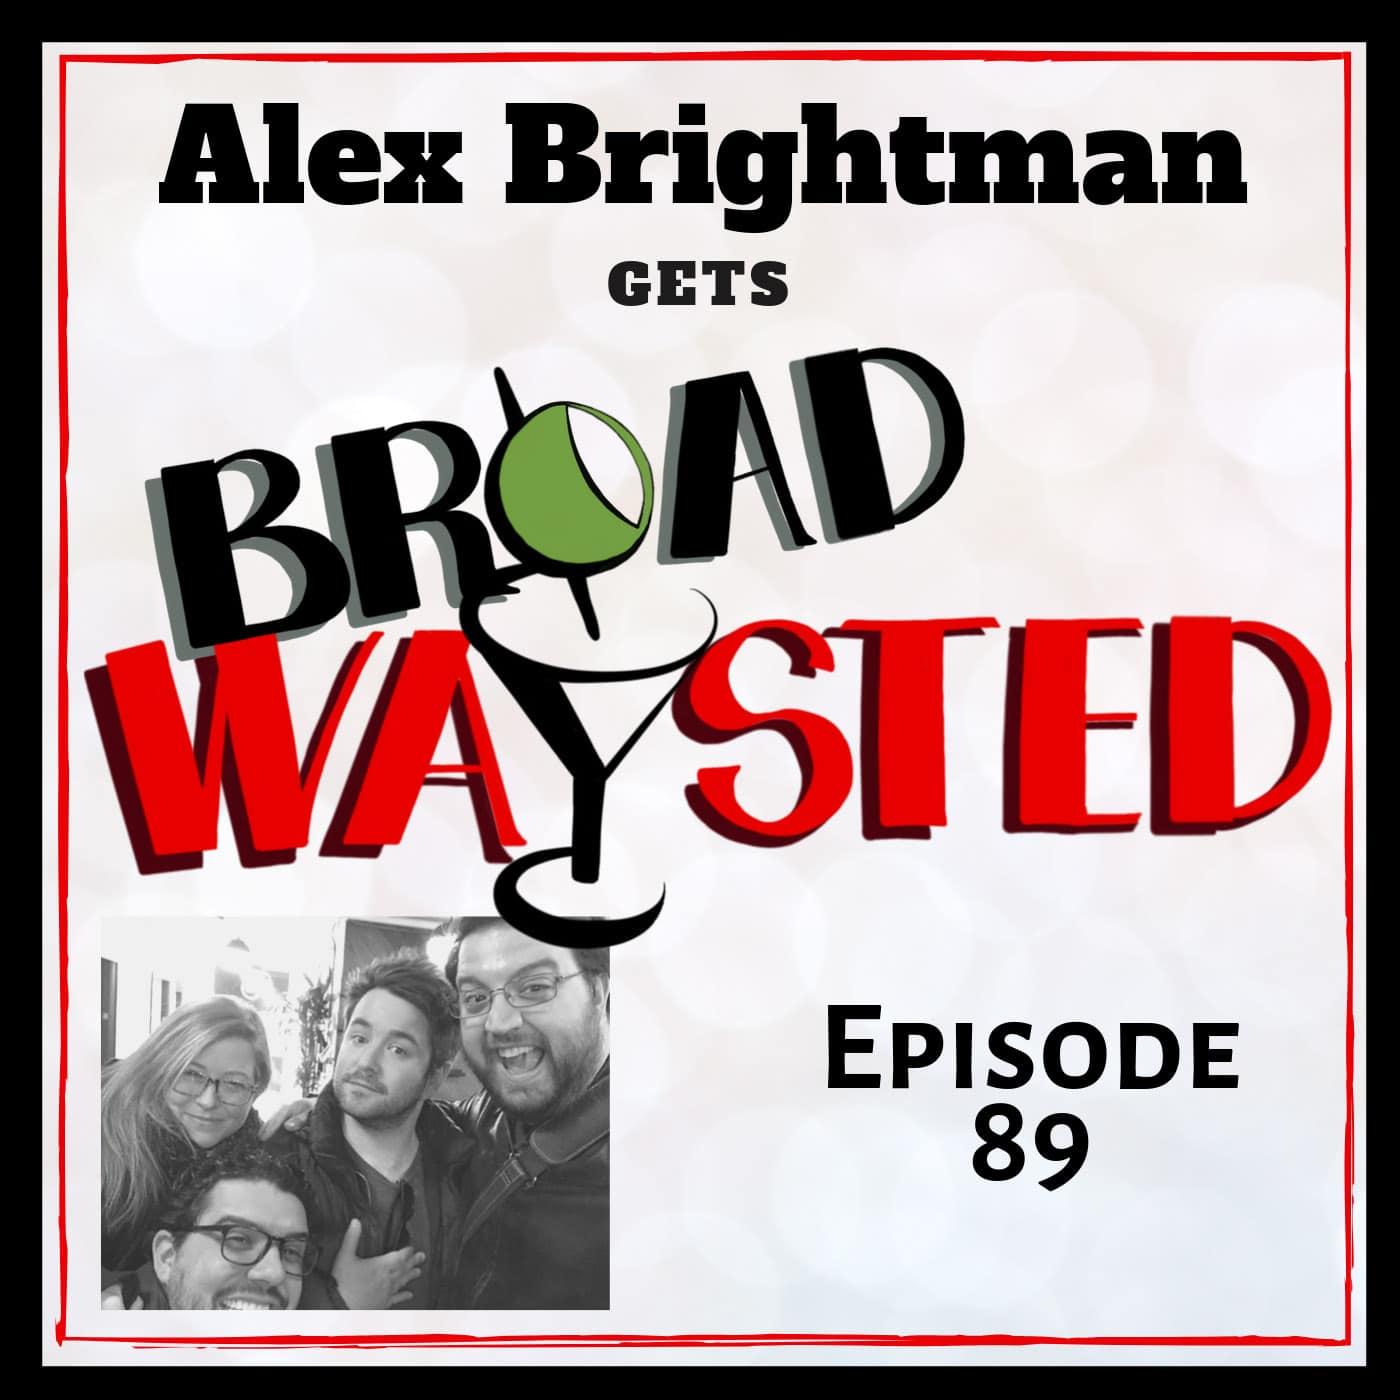 Broadwaysted Ep 89 Alex Brightman